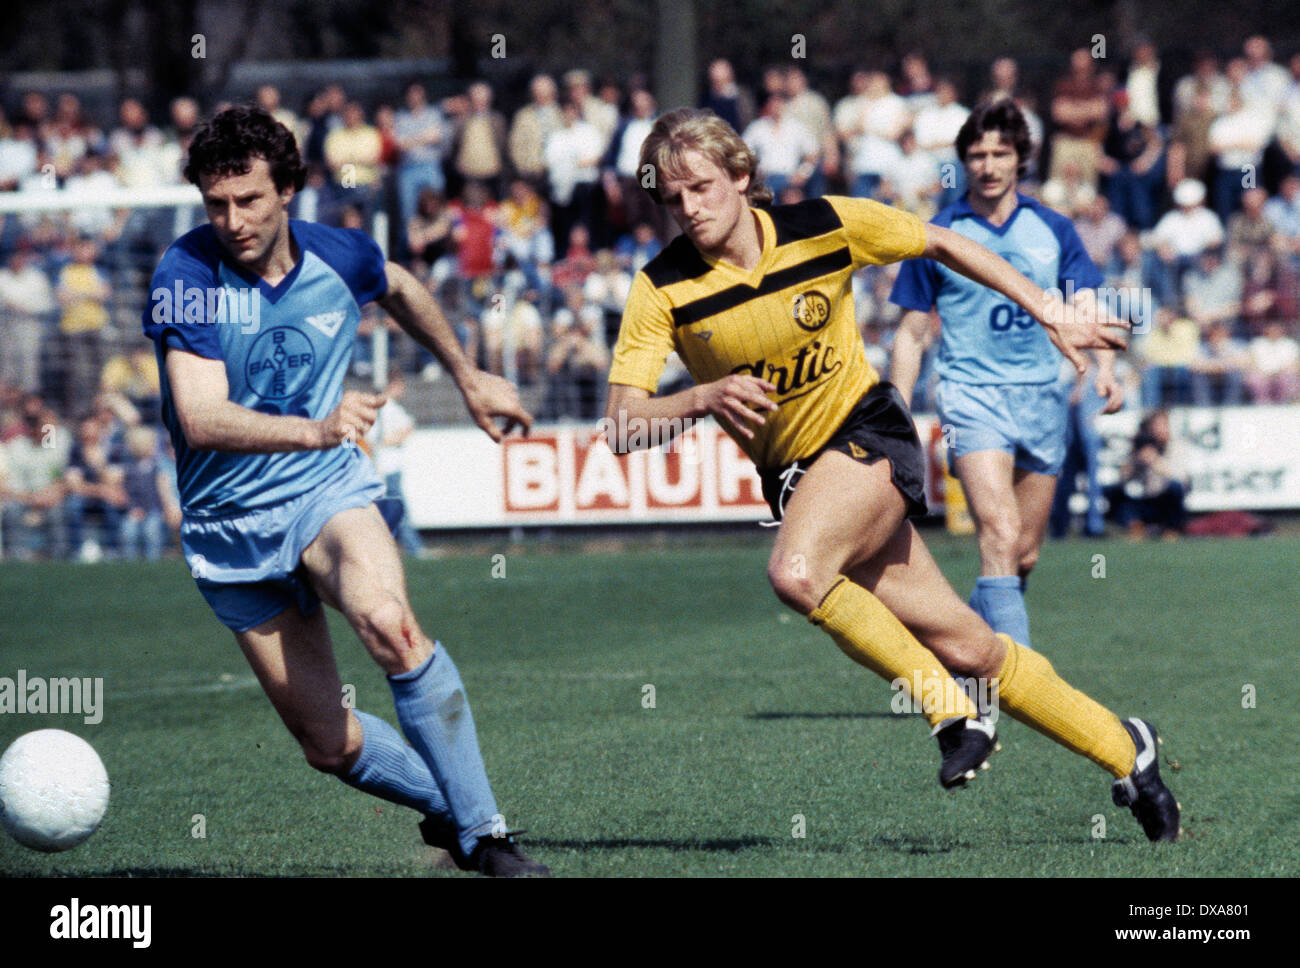 football, Bundesliga, 1983/1984, Grotenburg Stadium, FC Bayer 05 Uerdingen versus Borussia Dortmund 2:1, scene of the match, f.l.t.r. Peter Schwarz (Bayer), Werner Dressel (BVB), Norbert Hofmann (Bayer) - Stock Image